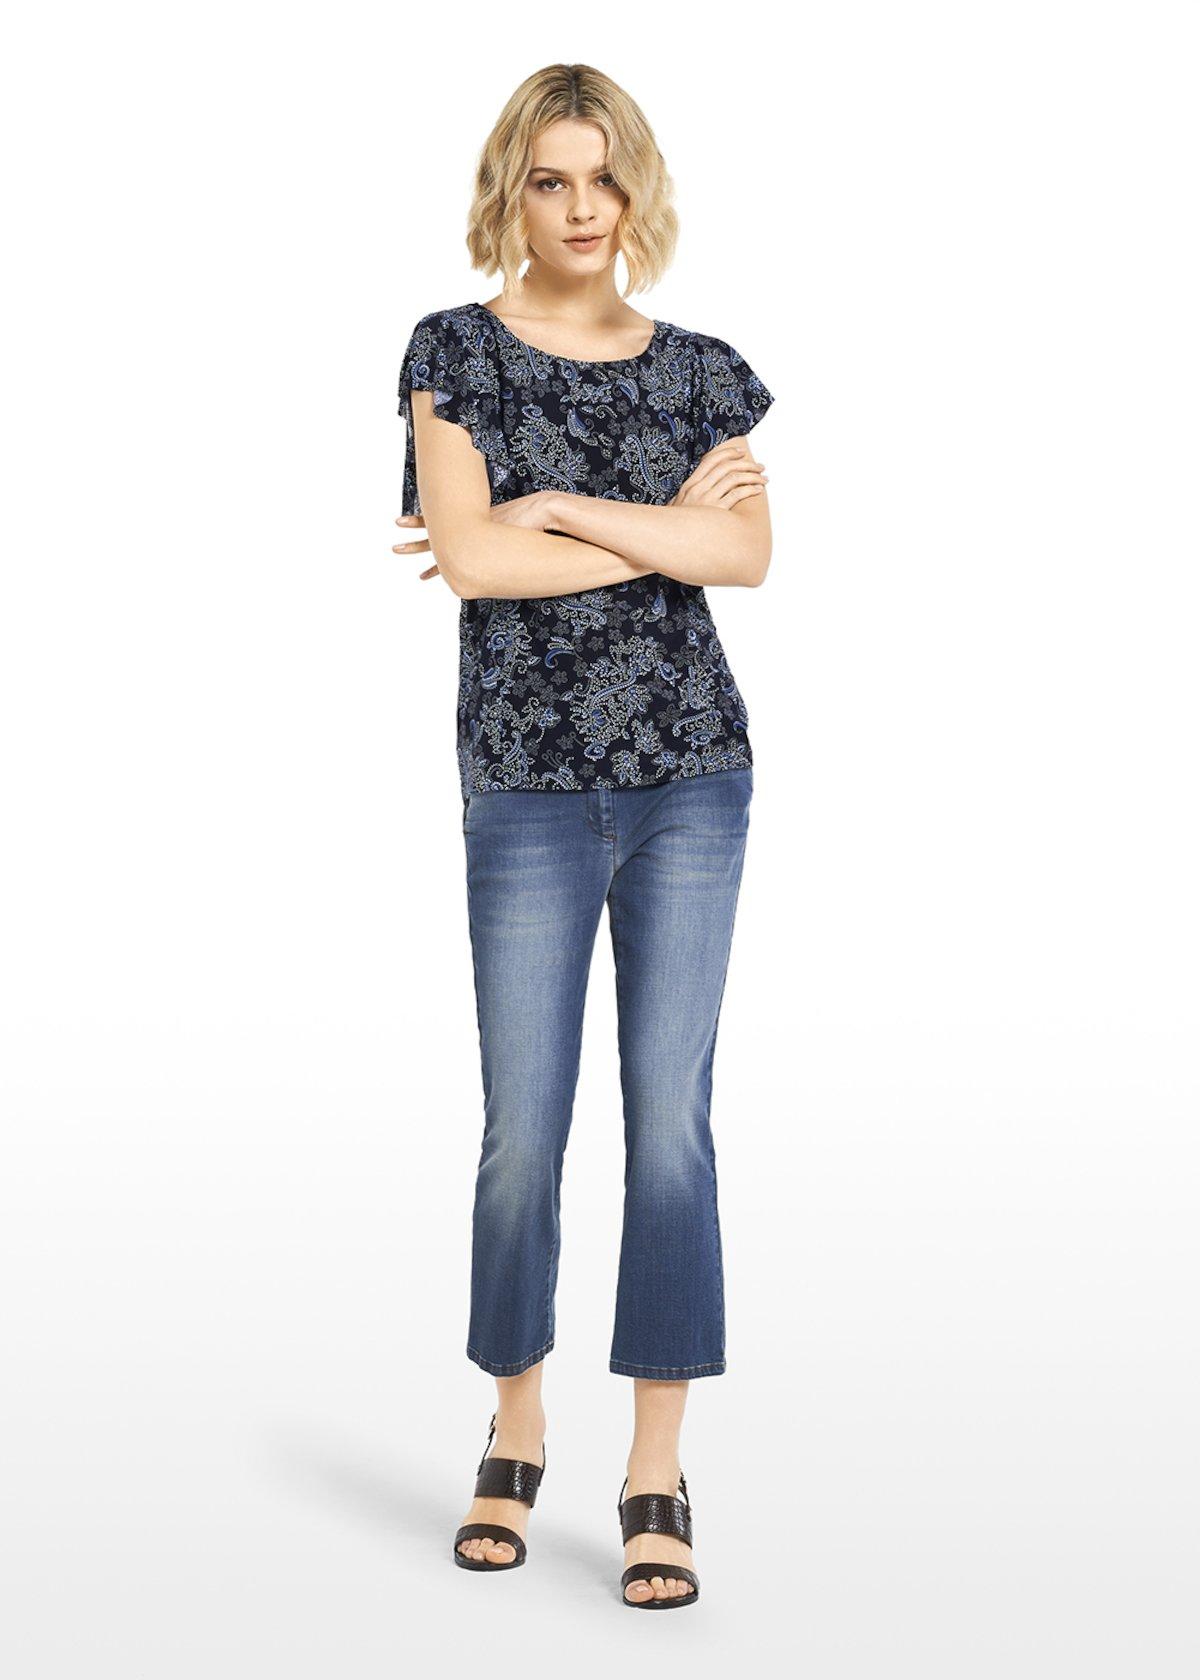 Safry paisley print jersey t-shirt - Blue / Avion Fantasia - Woman - Category image